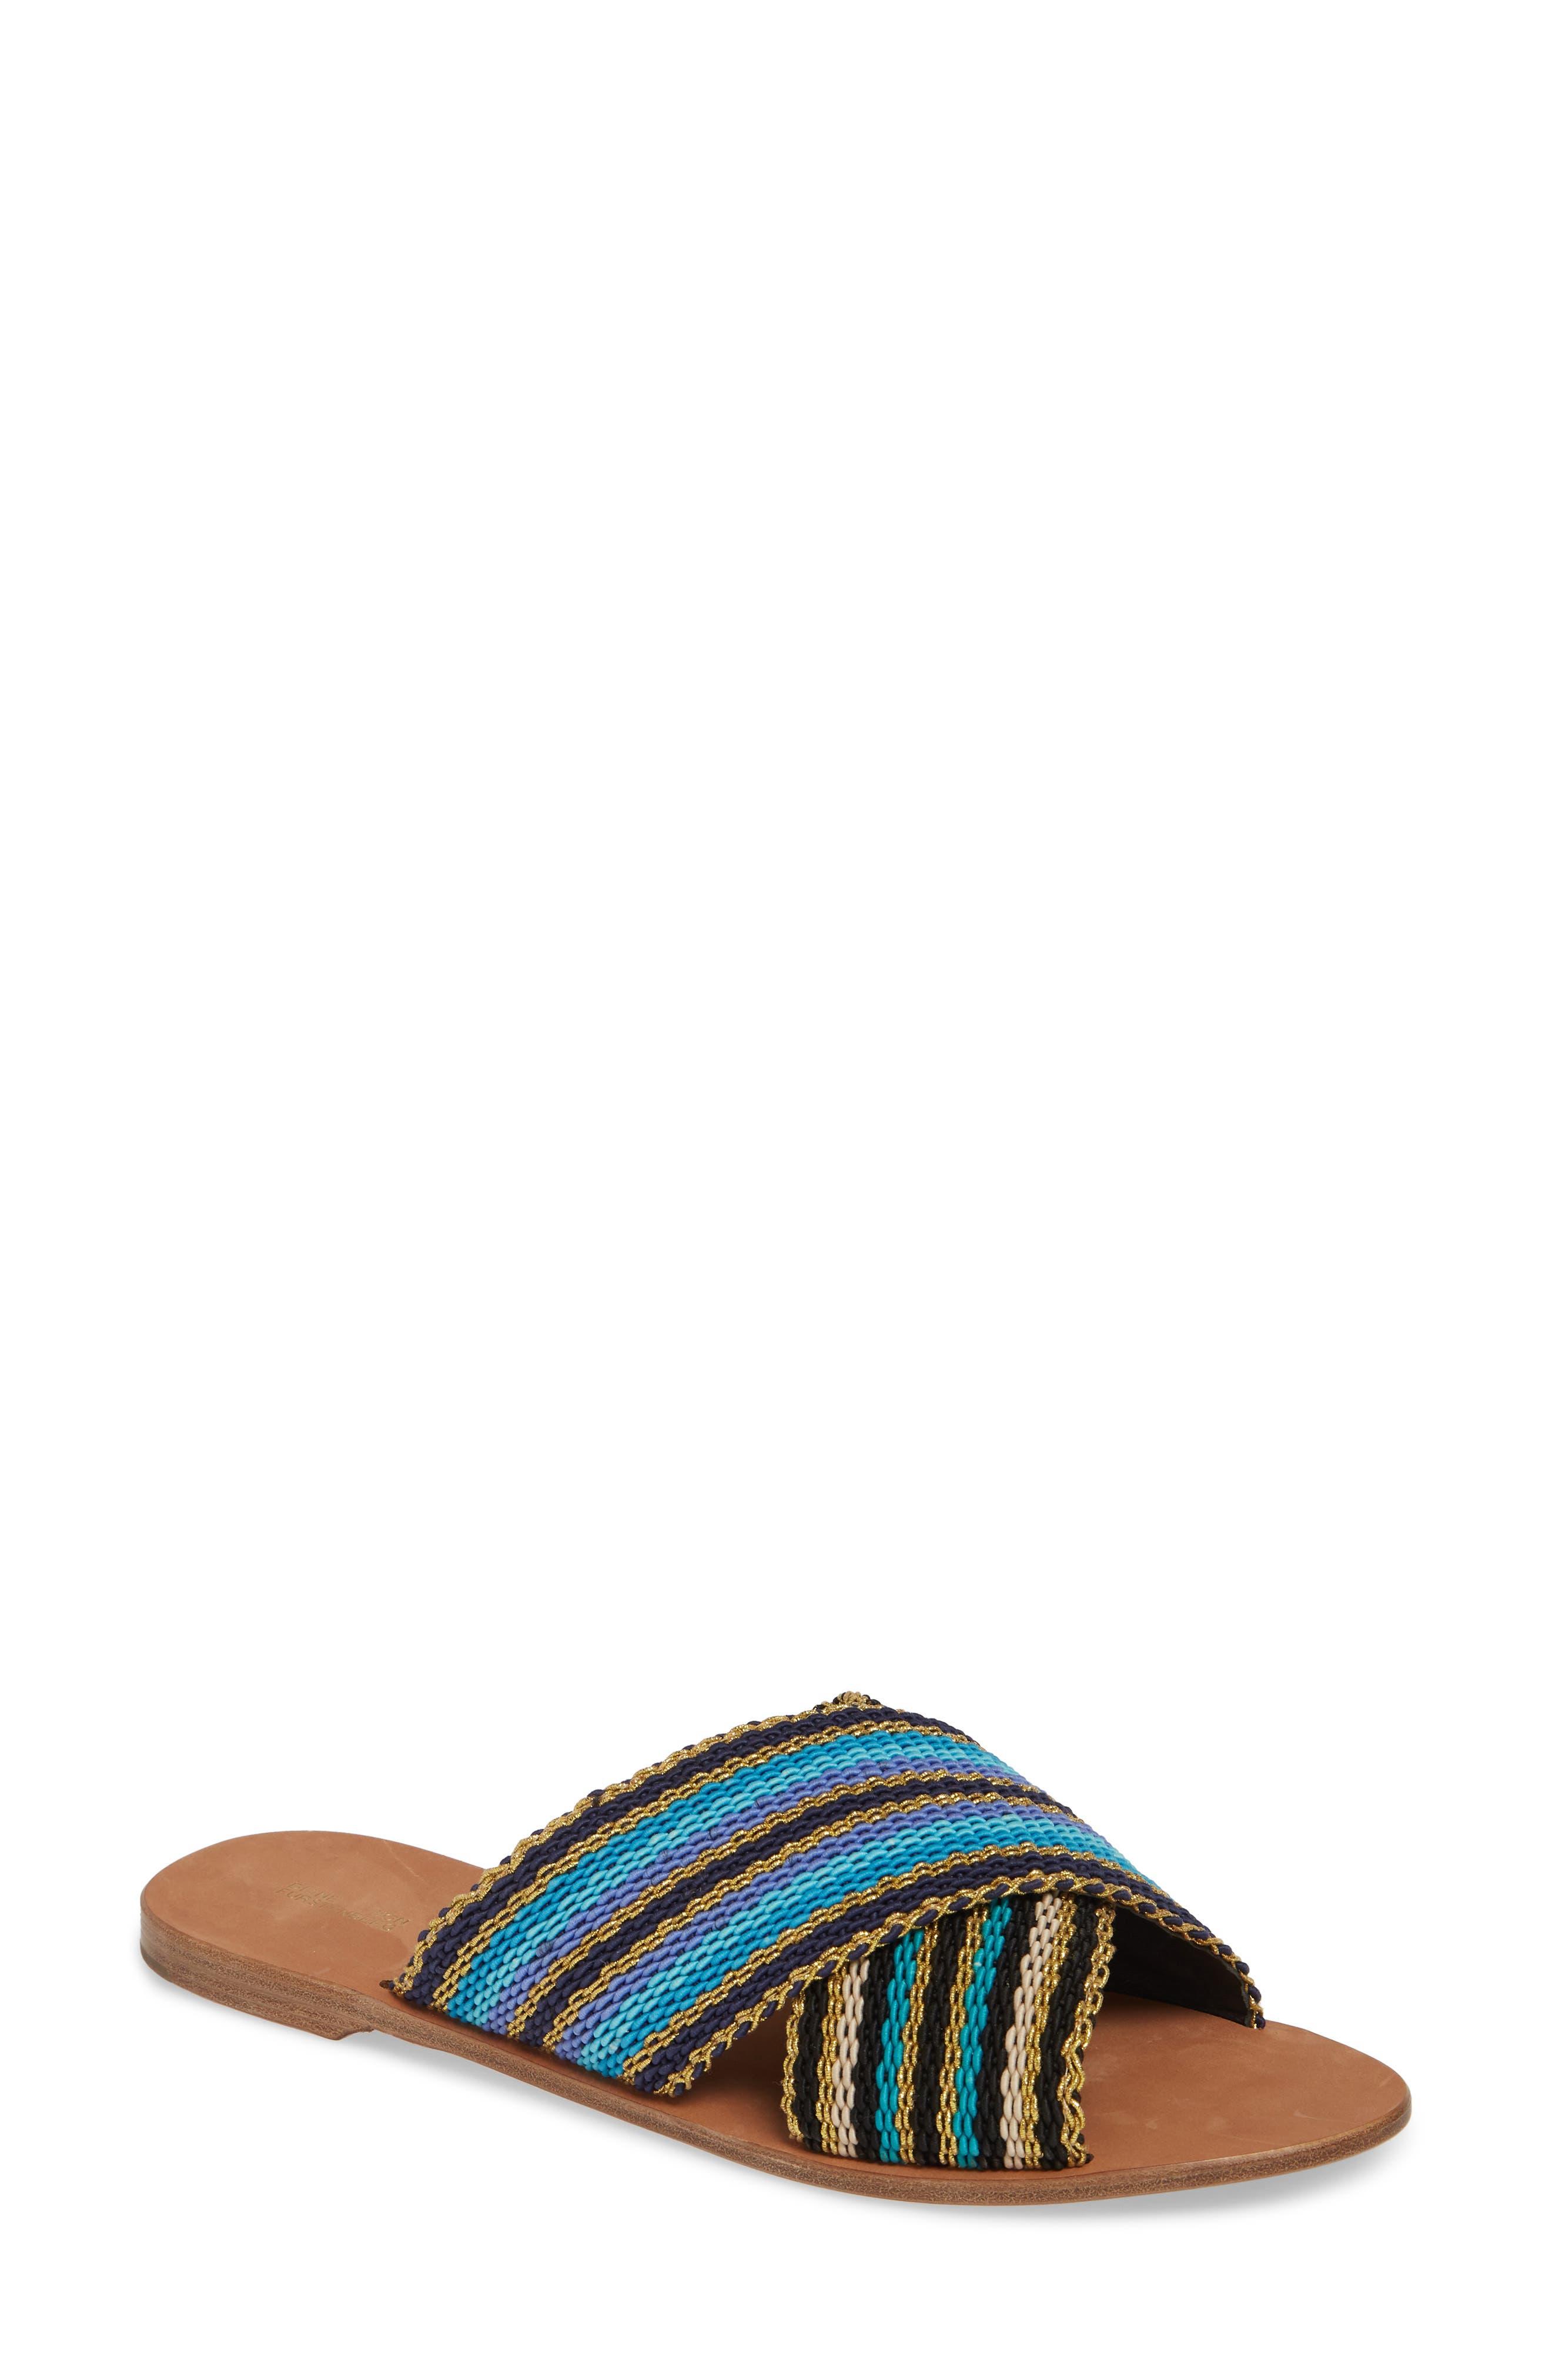 Diane Von Furstenberg Cindi Woven Slide Sandal, Blue